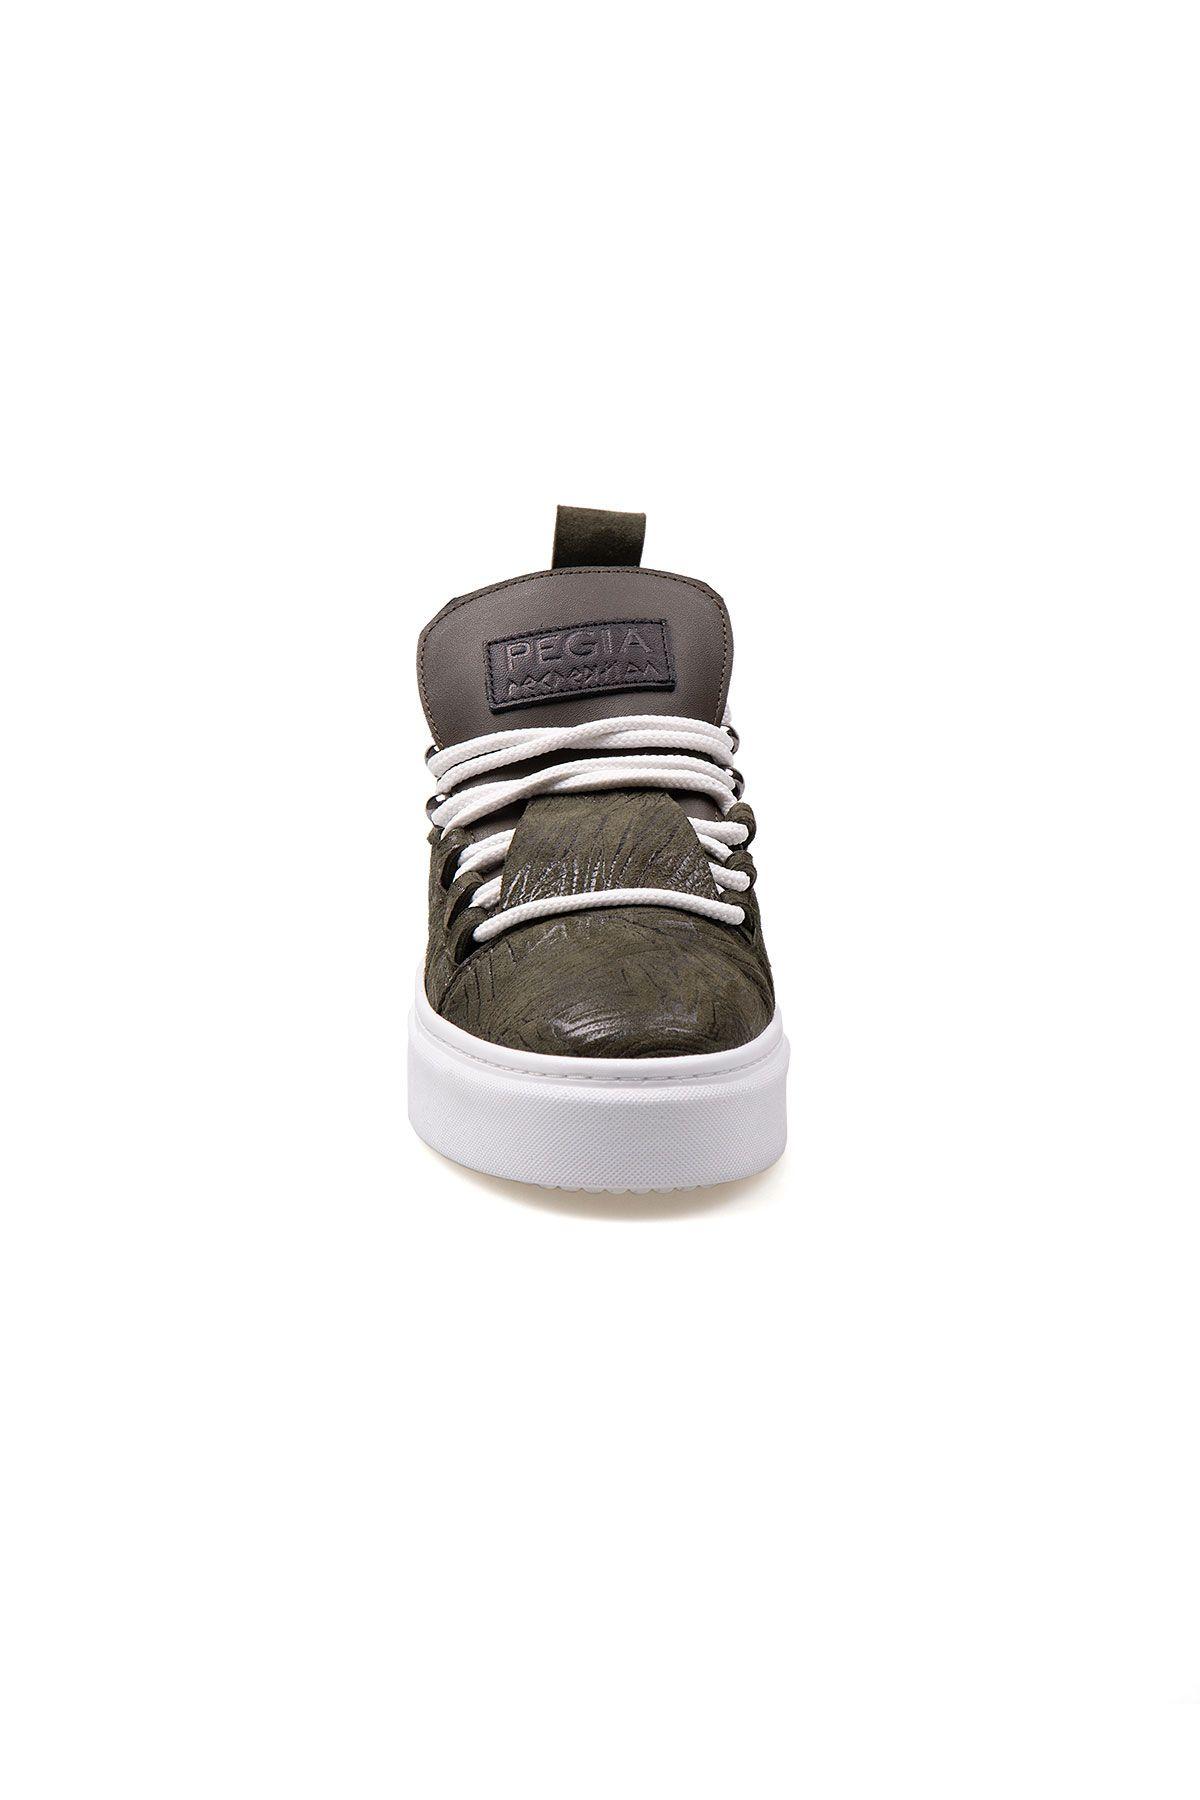 Pegia Genuine Leather Women's Sneaker LA1709 Khaki